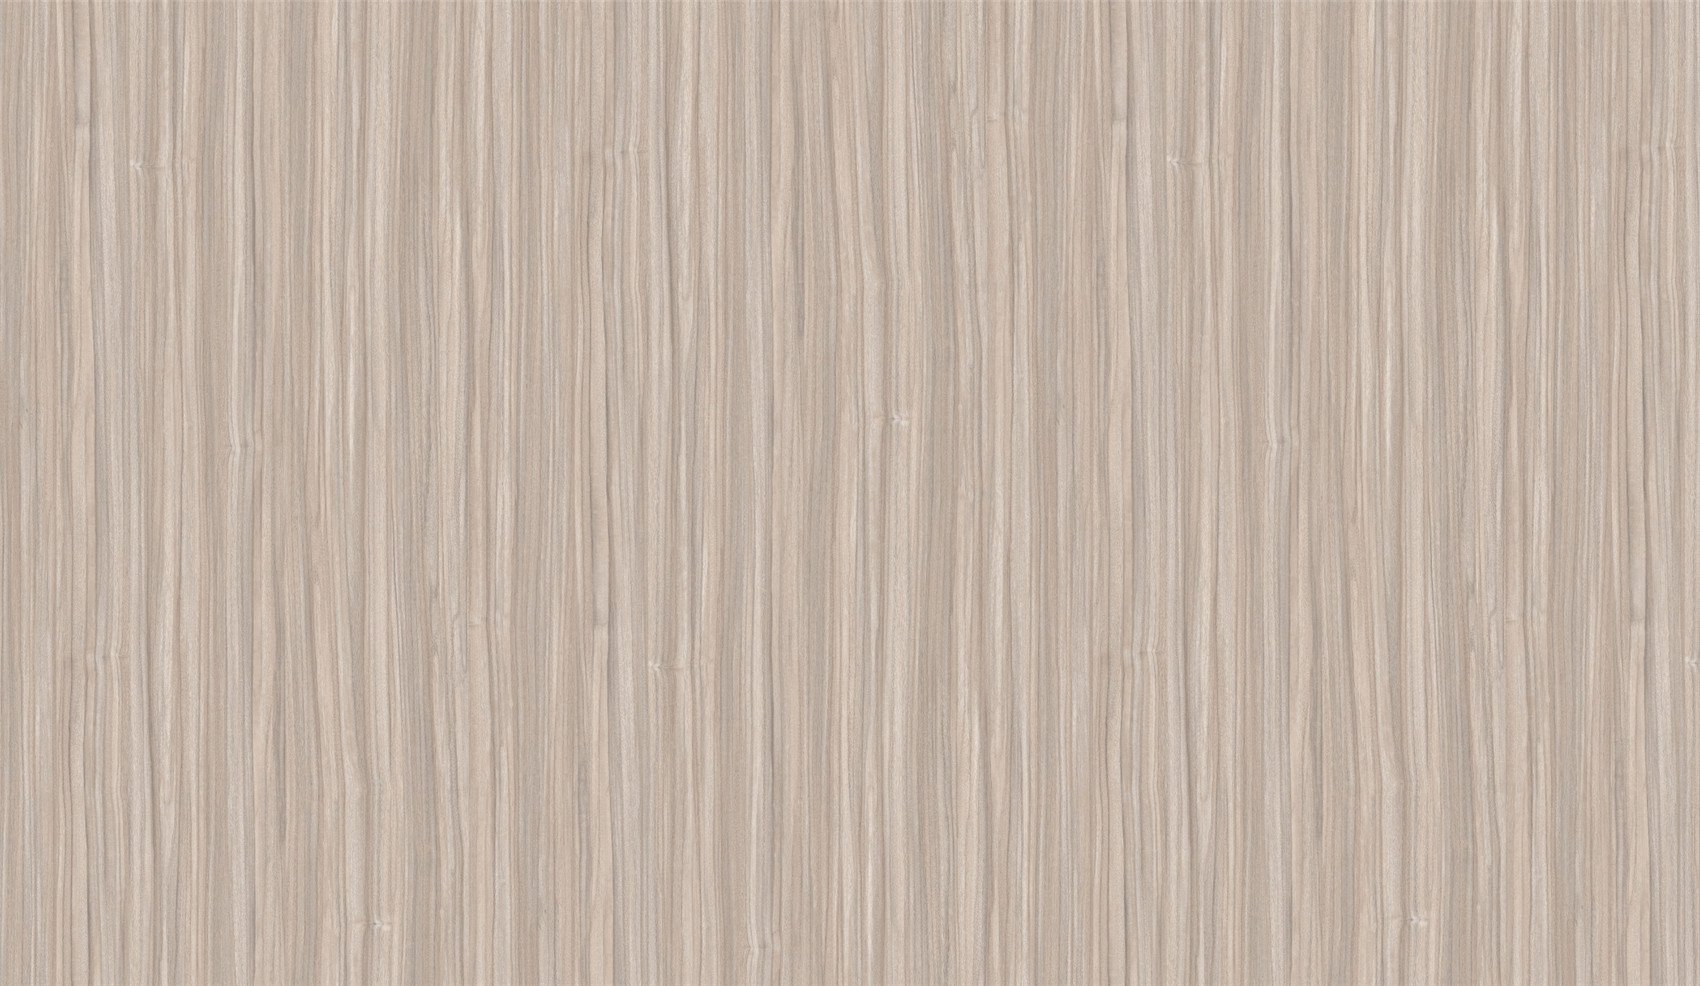 78190  idecor decor paper ash up to 7ft